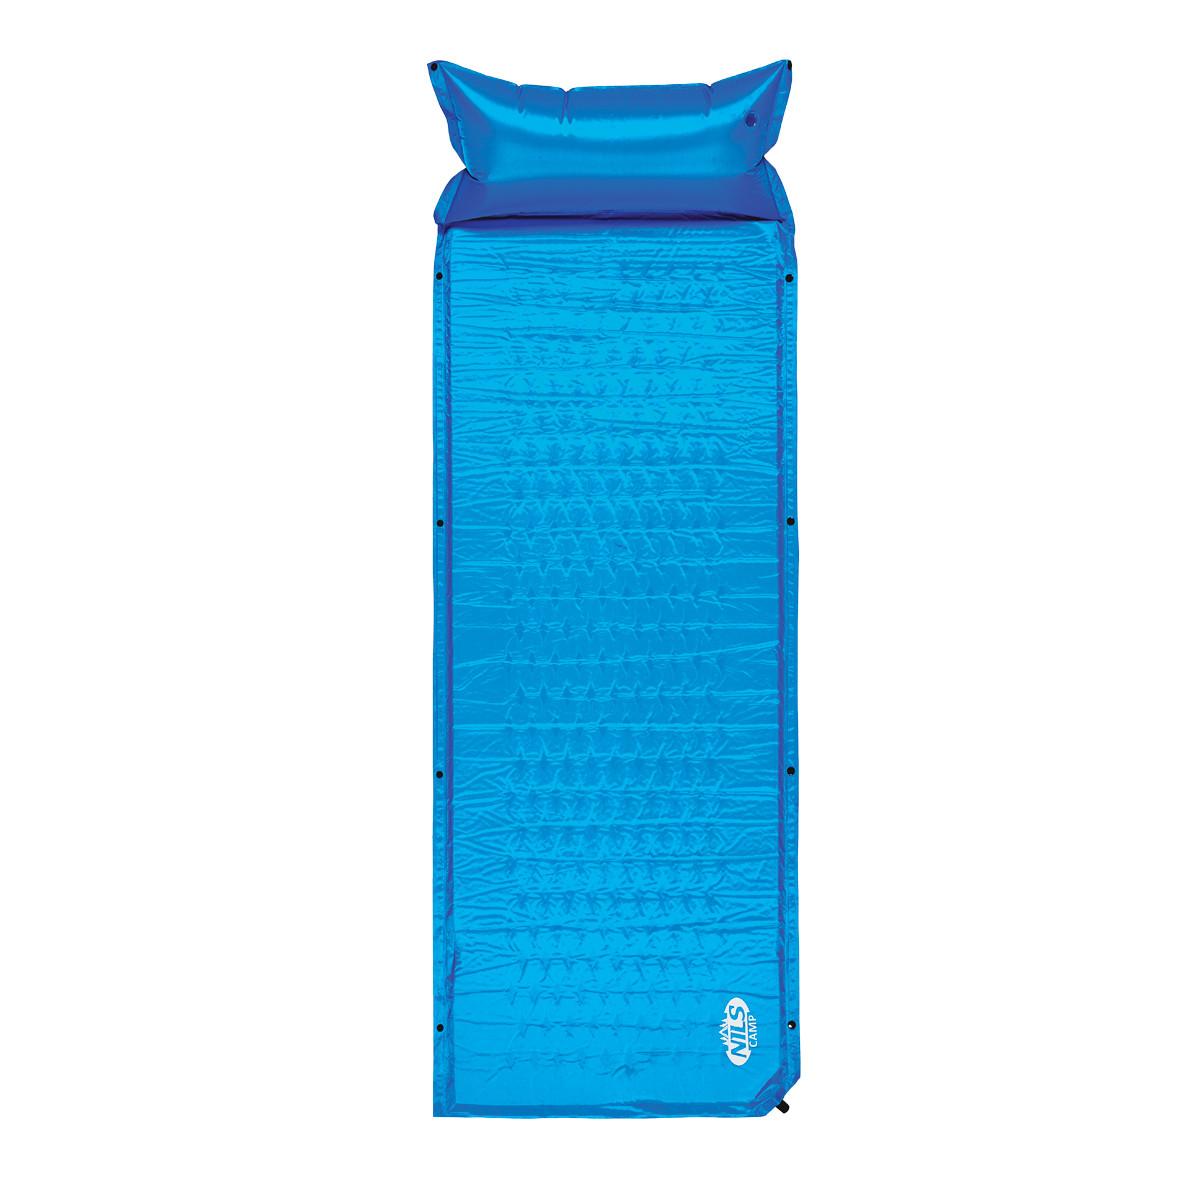 Самонадувний килимок Nils Camp NC1006 186 x 65 x 2.5 см Blue